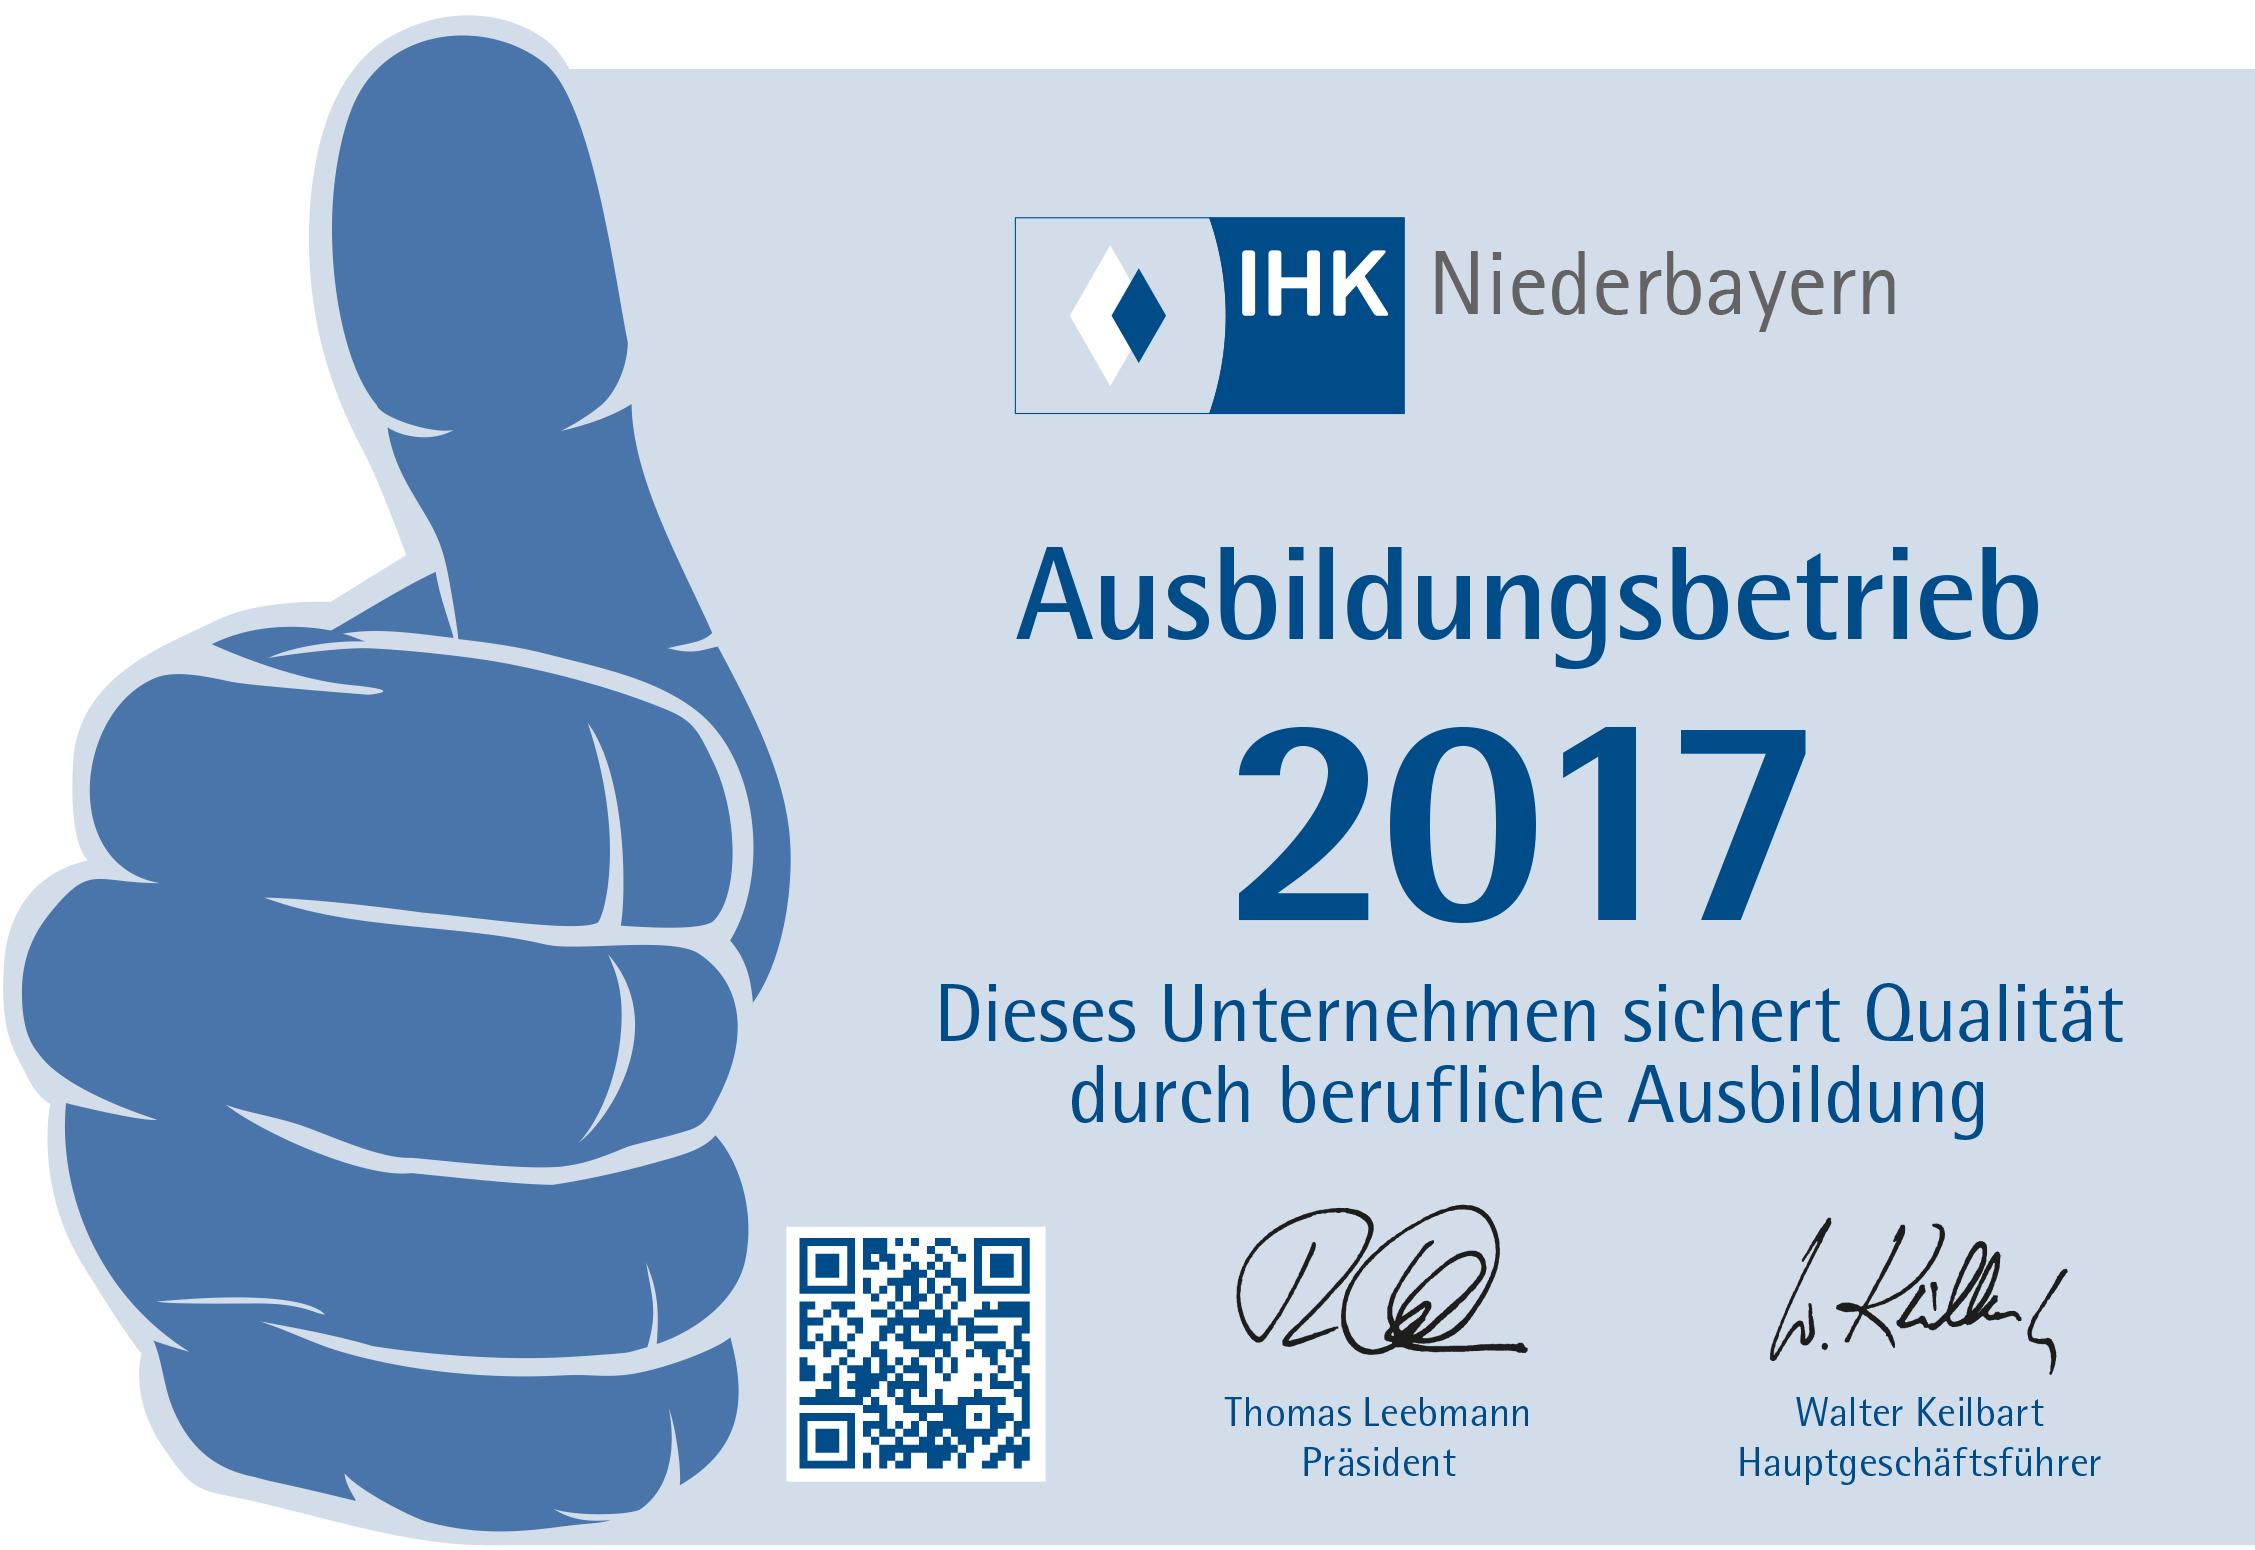 Aufkleber-IHK-Passau-normal-2017.jpg#asset:1630